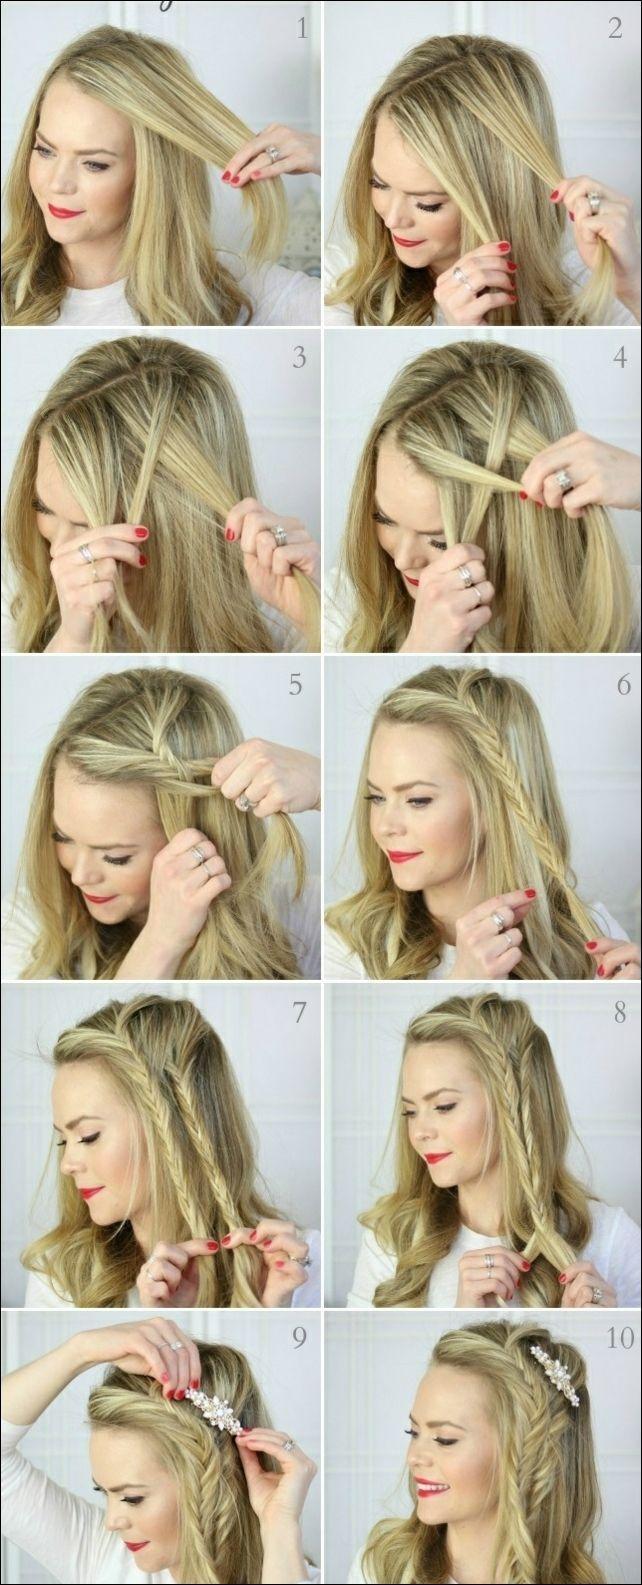 Nice braiding hair long hair tips 2018   Hairstyle trend   Hairstyles women #styles #frisurentrends #styles #frisurenkurz #frisurideen #fr …